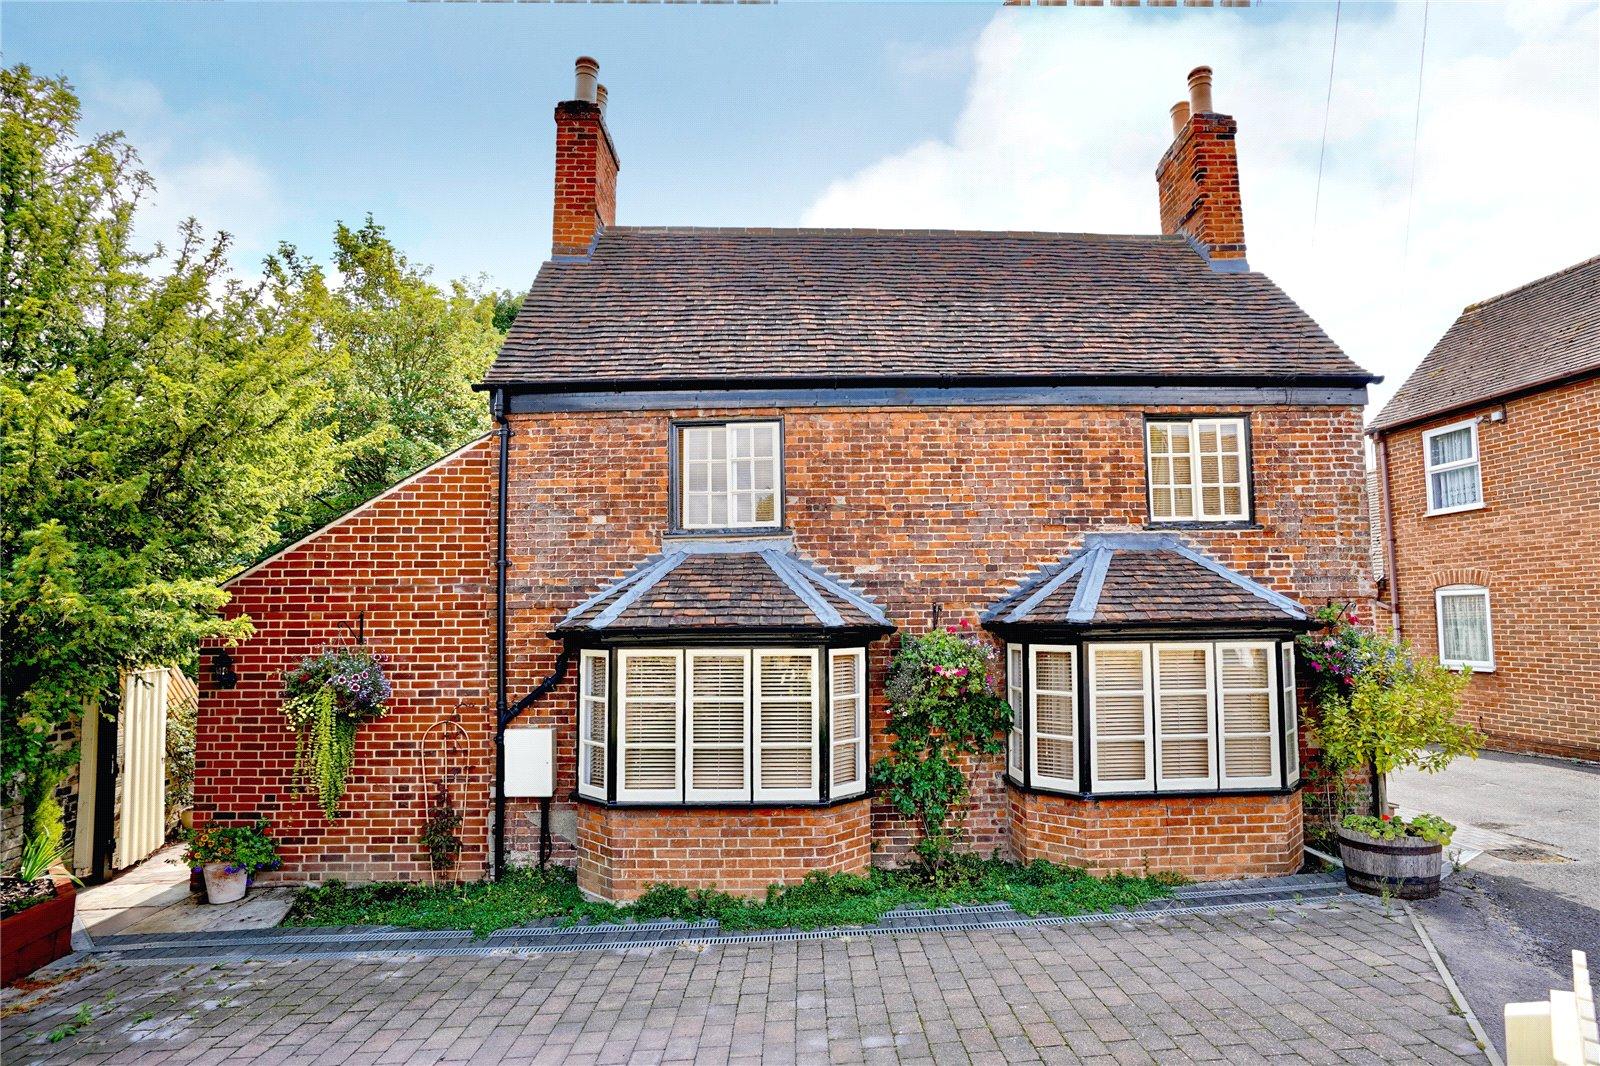 3 bed house for sale in St Marys Street, Eynesbury, PE19